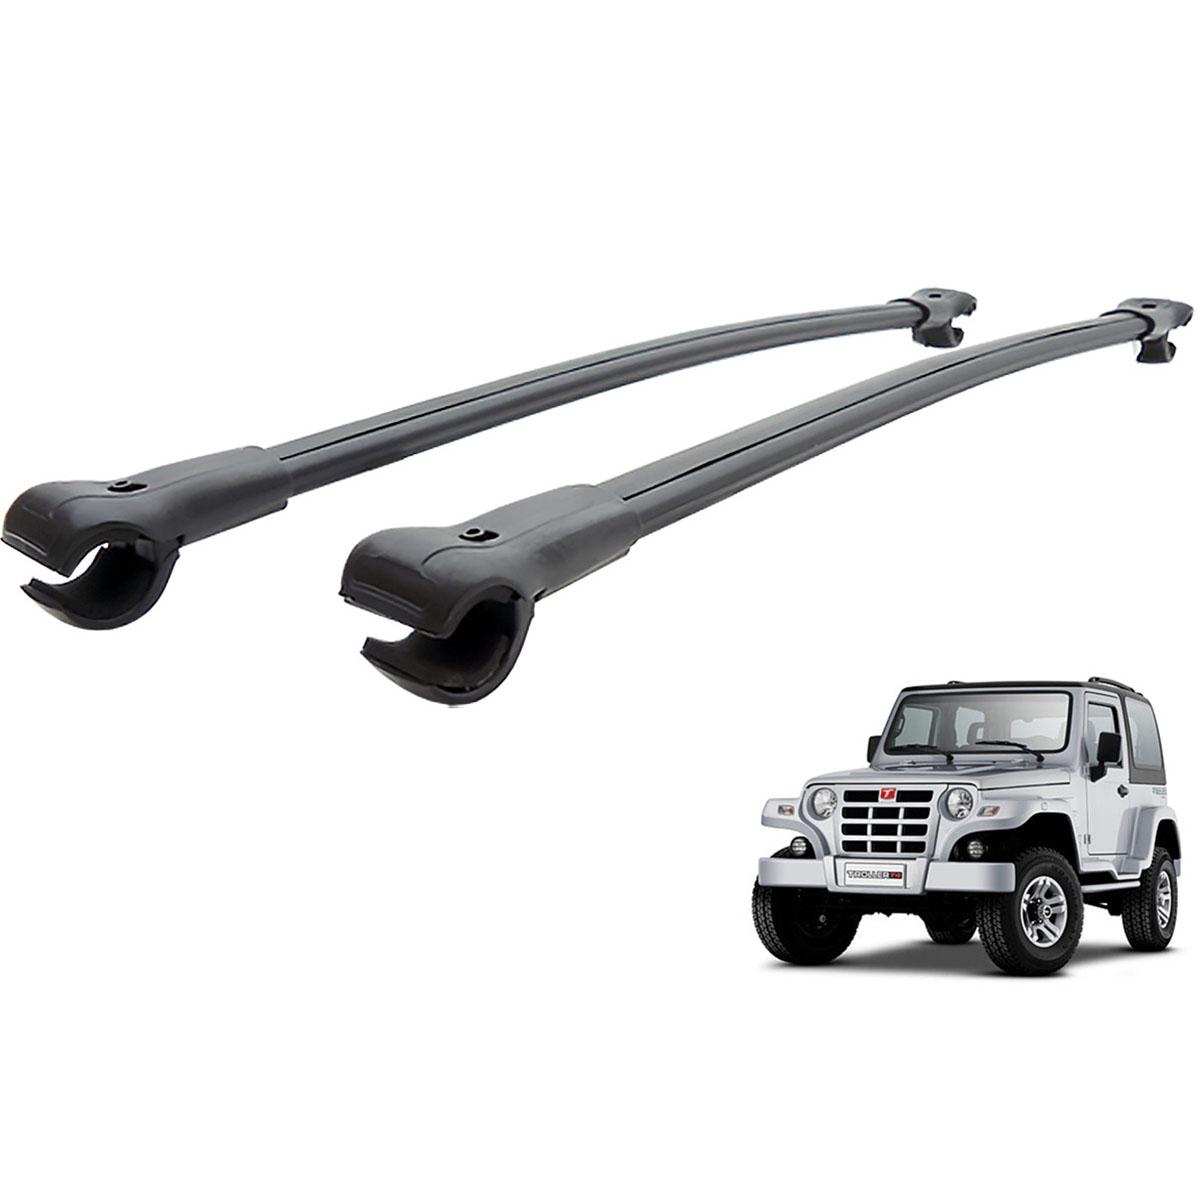 Travessa rack de teto larga preta alumínio Troller 2001 a 2008